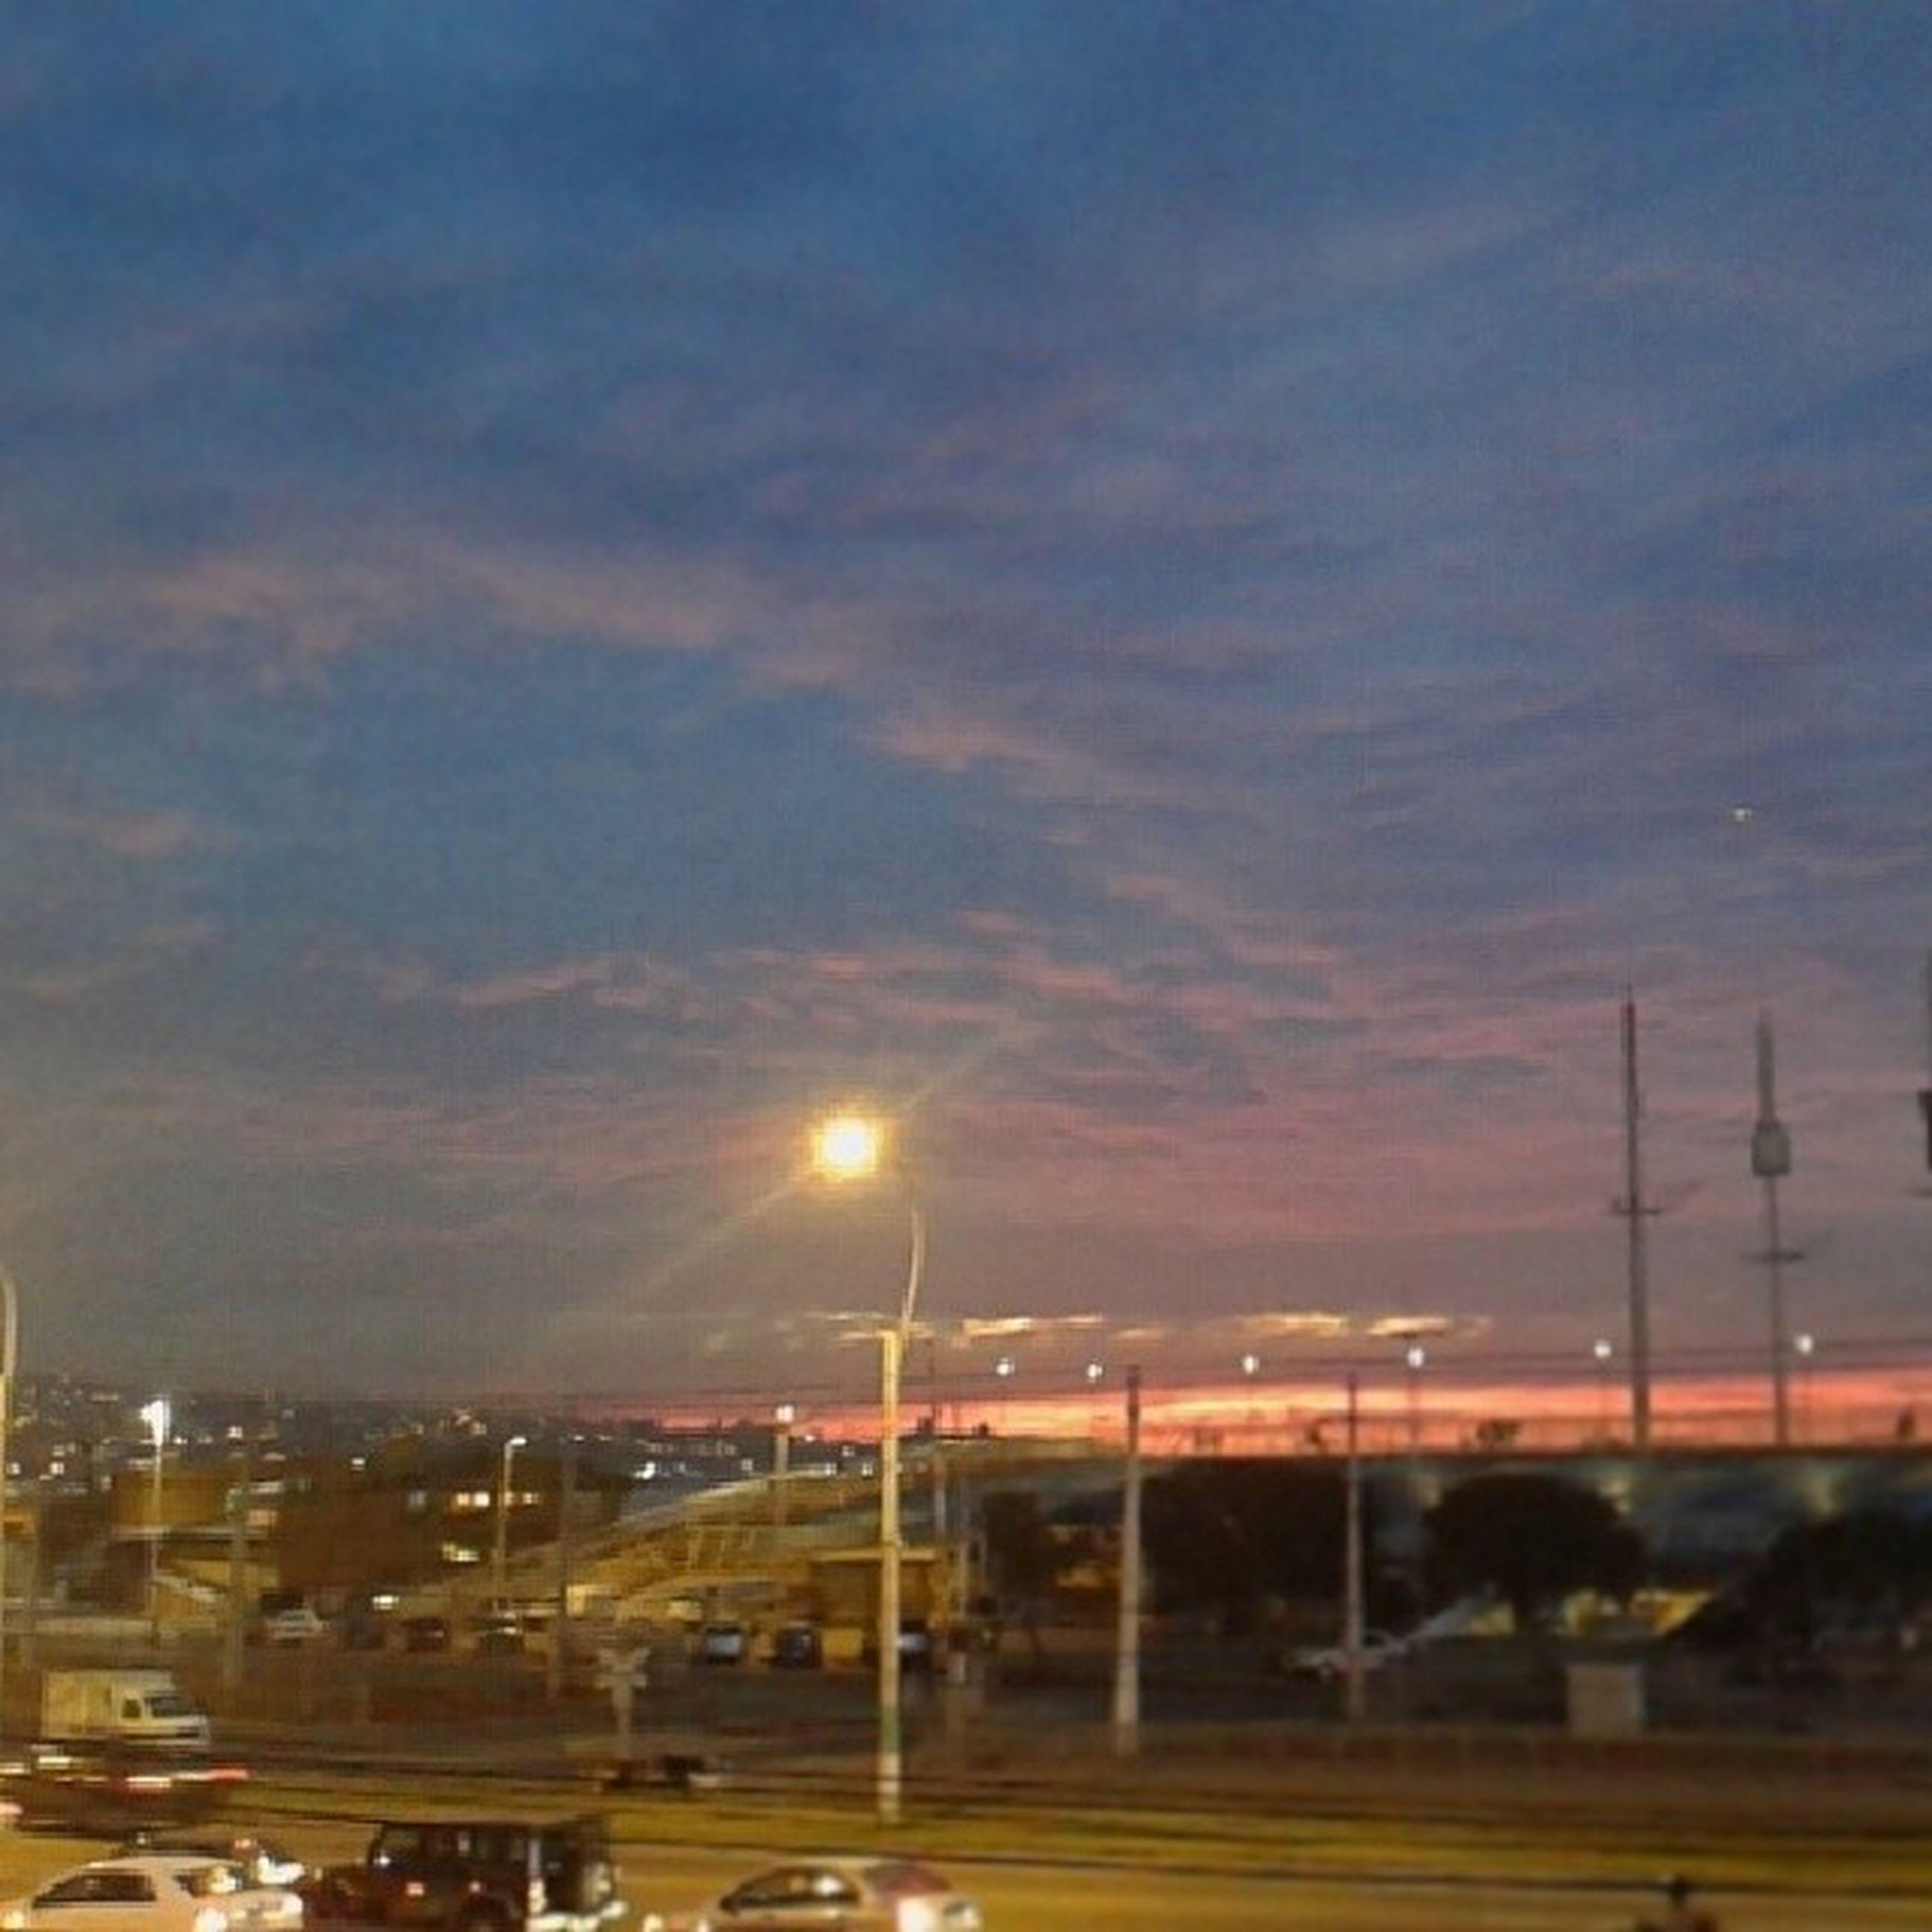 sky, illuminated, street light, cloud - sky, night, lighting equipment, cloudy, sunset, dusk, transportation, road, cloud, outdoors, dramatic sky, weather, nature, street, car, silhouette, no people